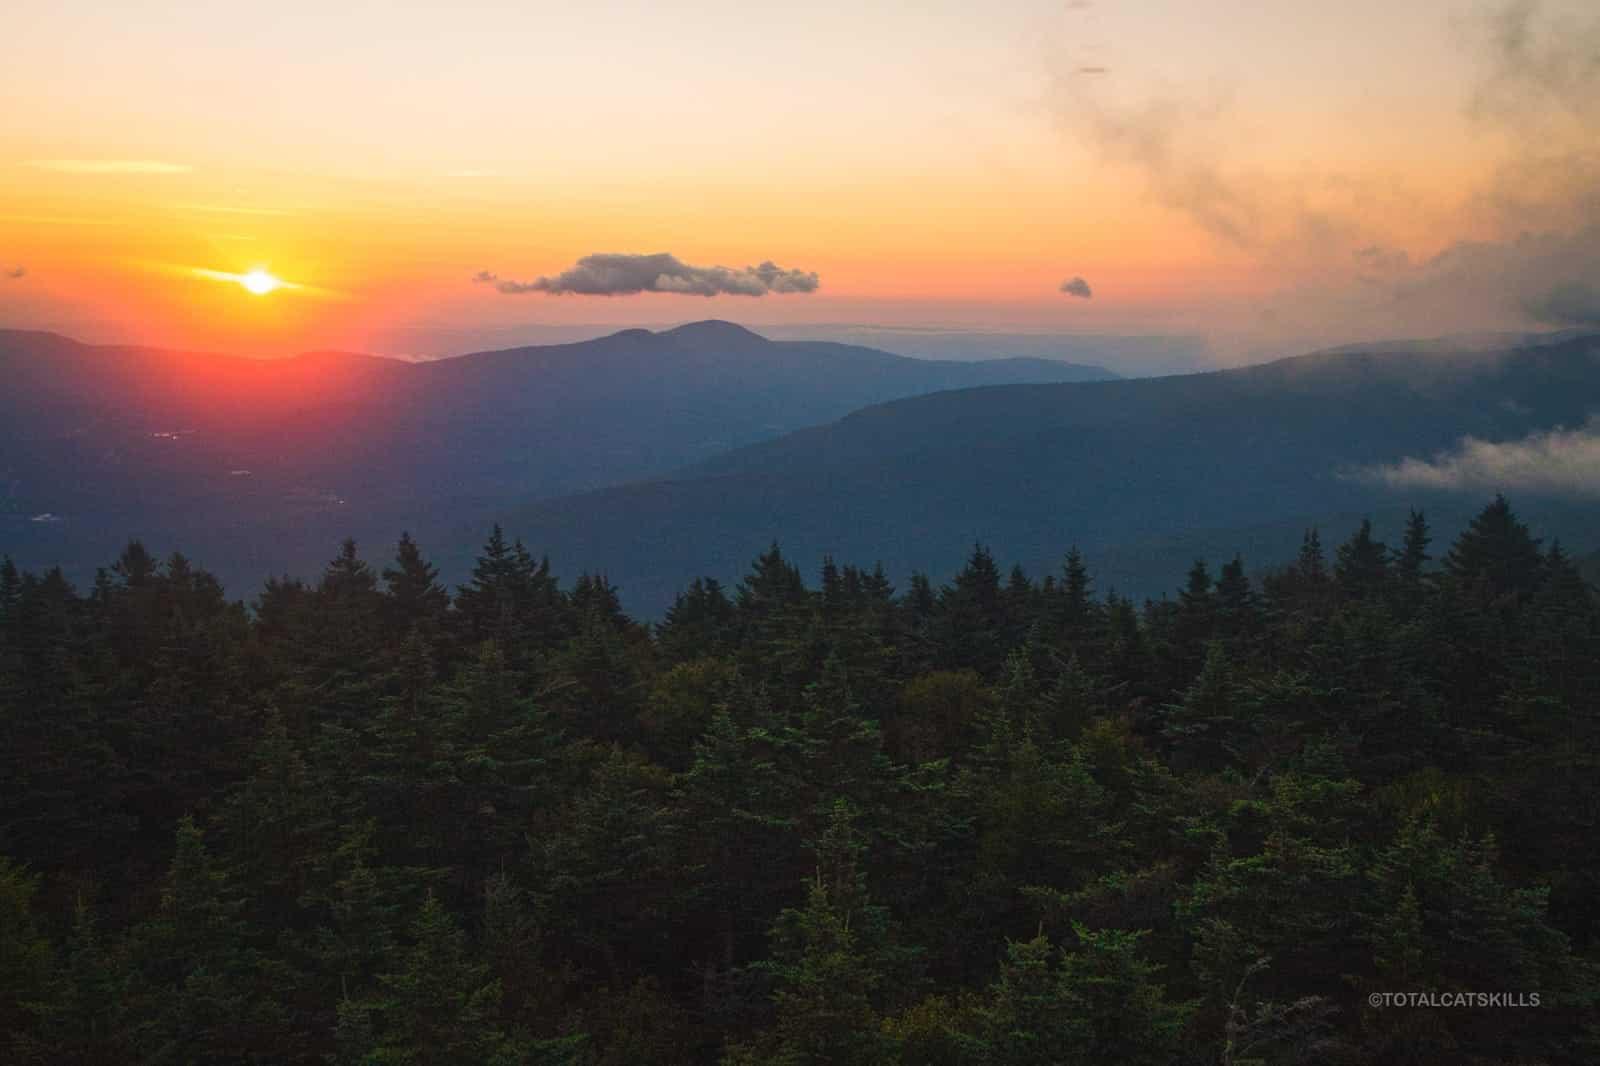 dawn over mountain range